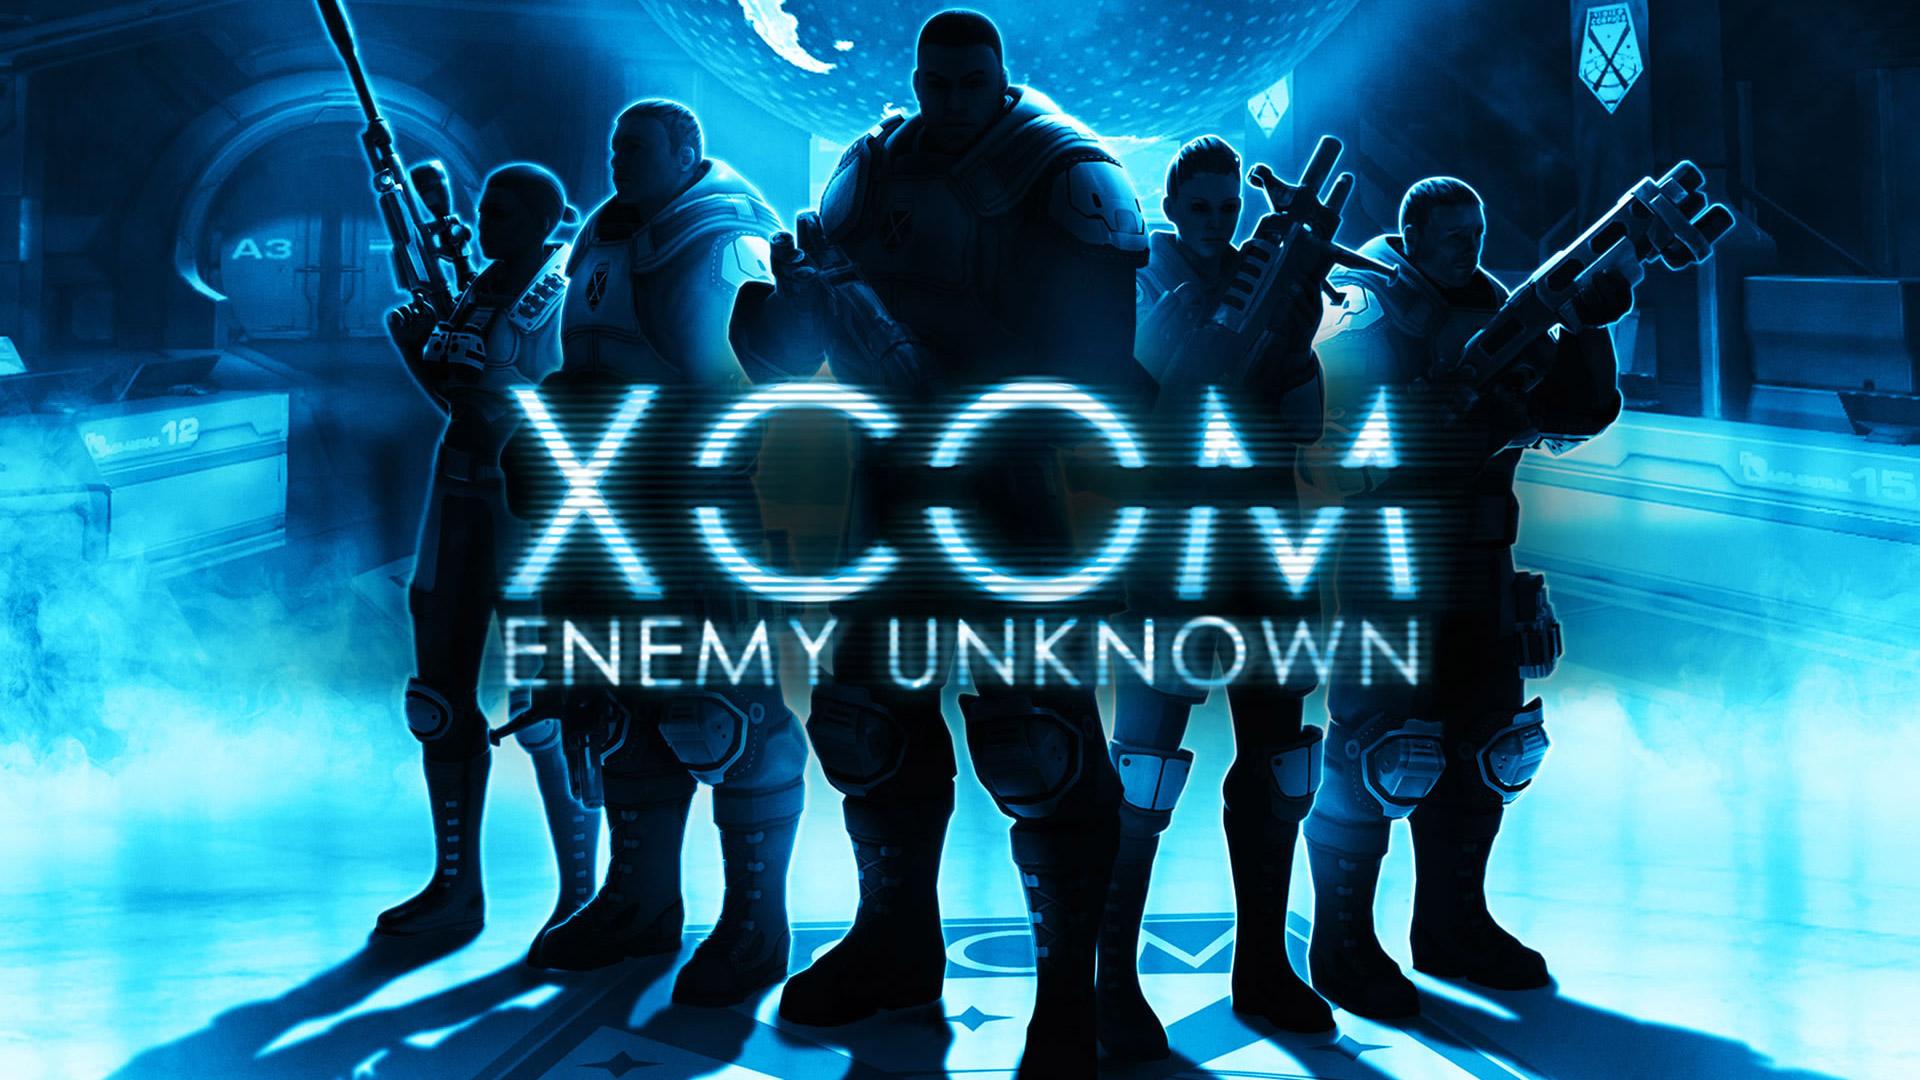 Free XCOM: Enemy Unknown Wallpaper in 1920x1080